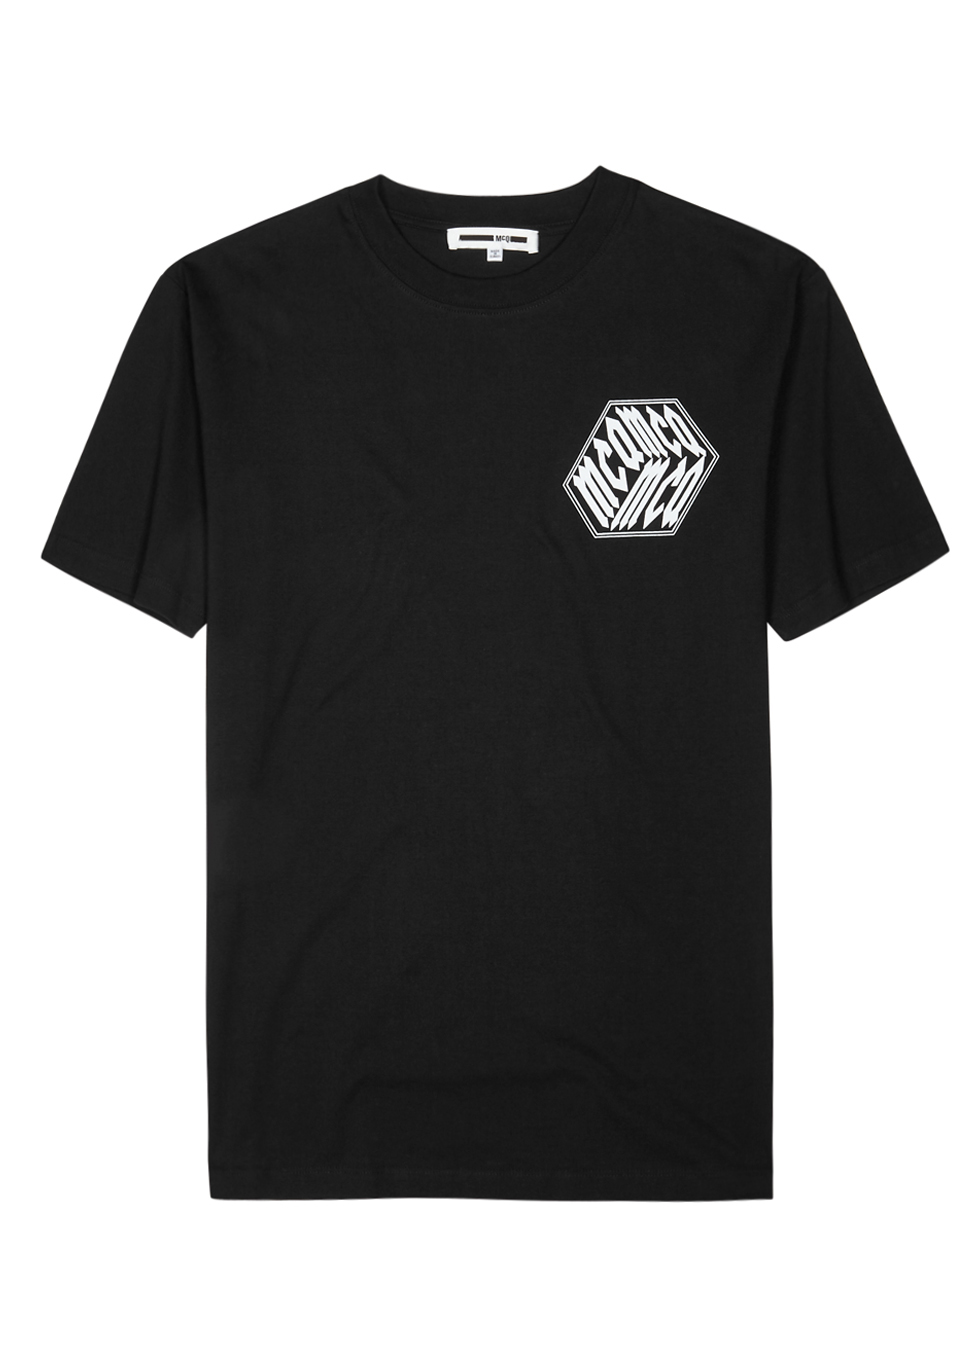 MCQ BY ALEXANDER MCQUEEN Mcq Alexander Mcqueen Graphic Patch T-Shirt - Black